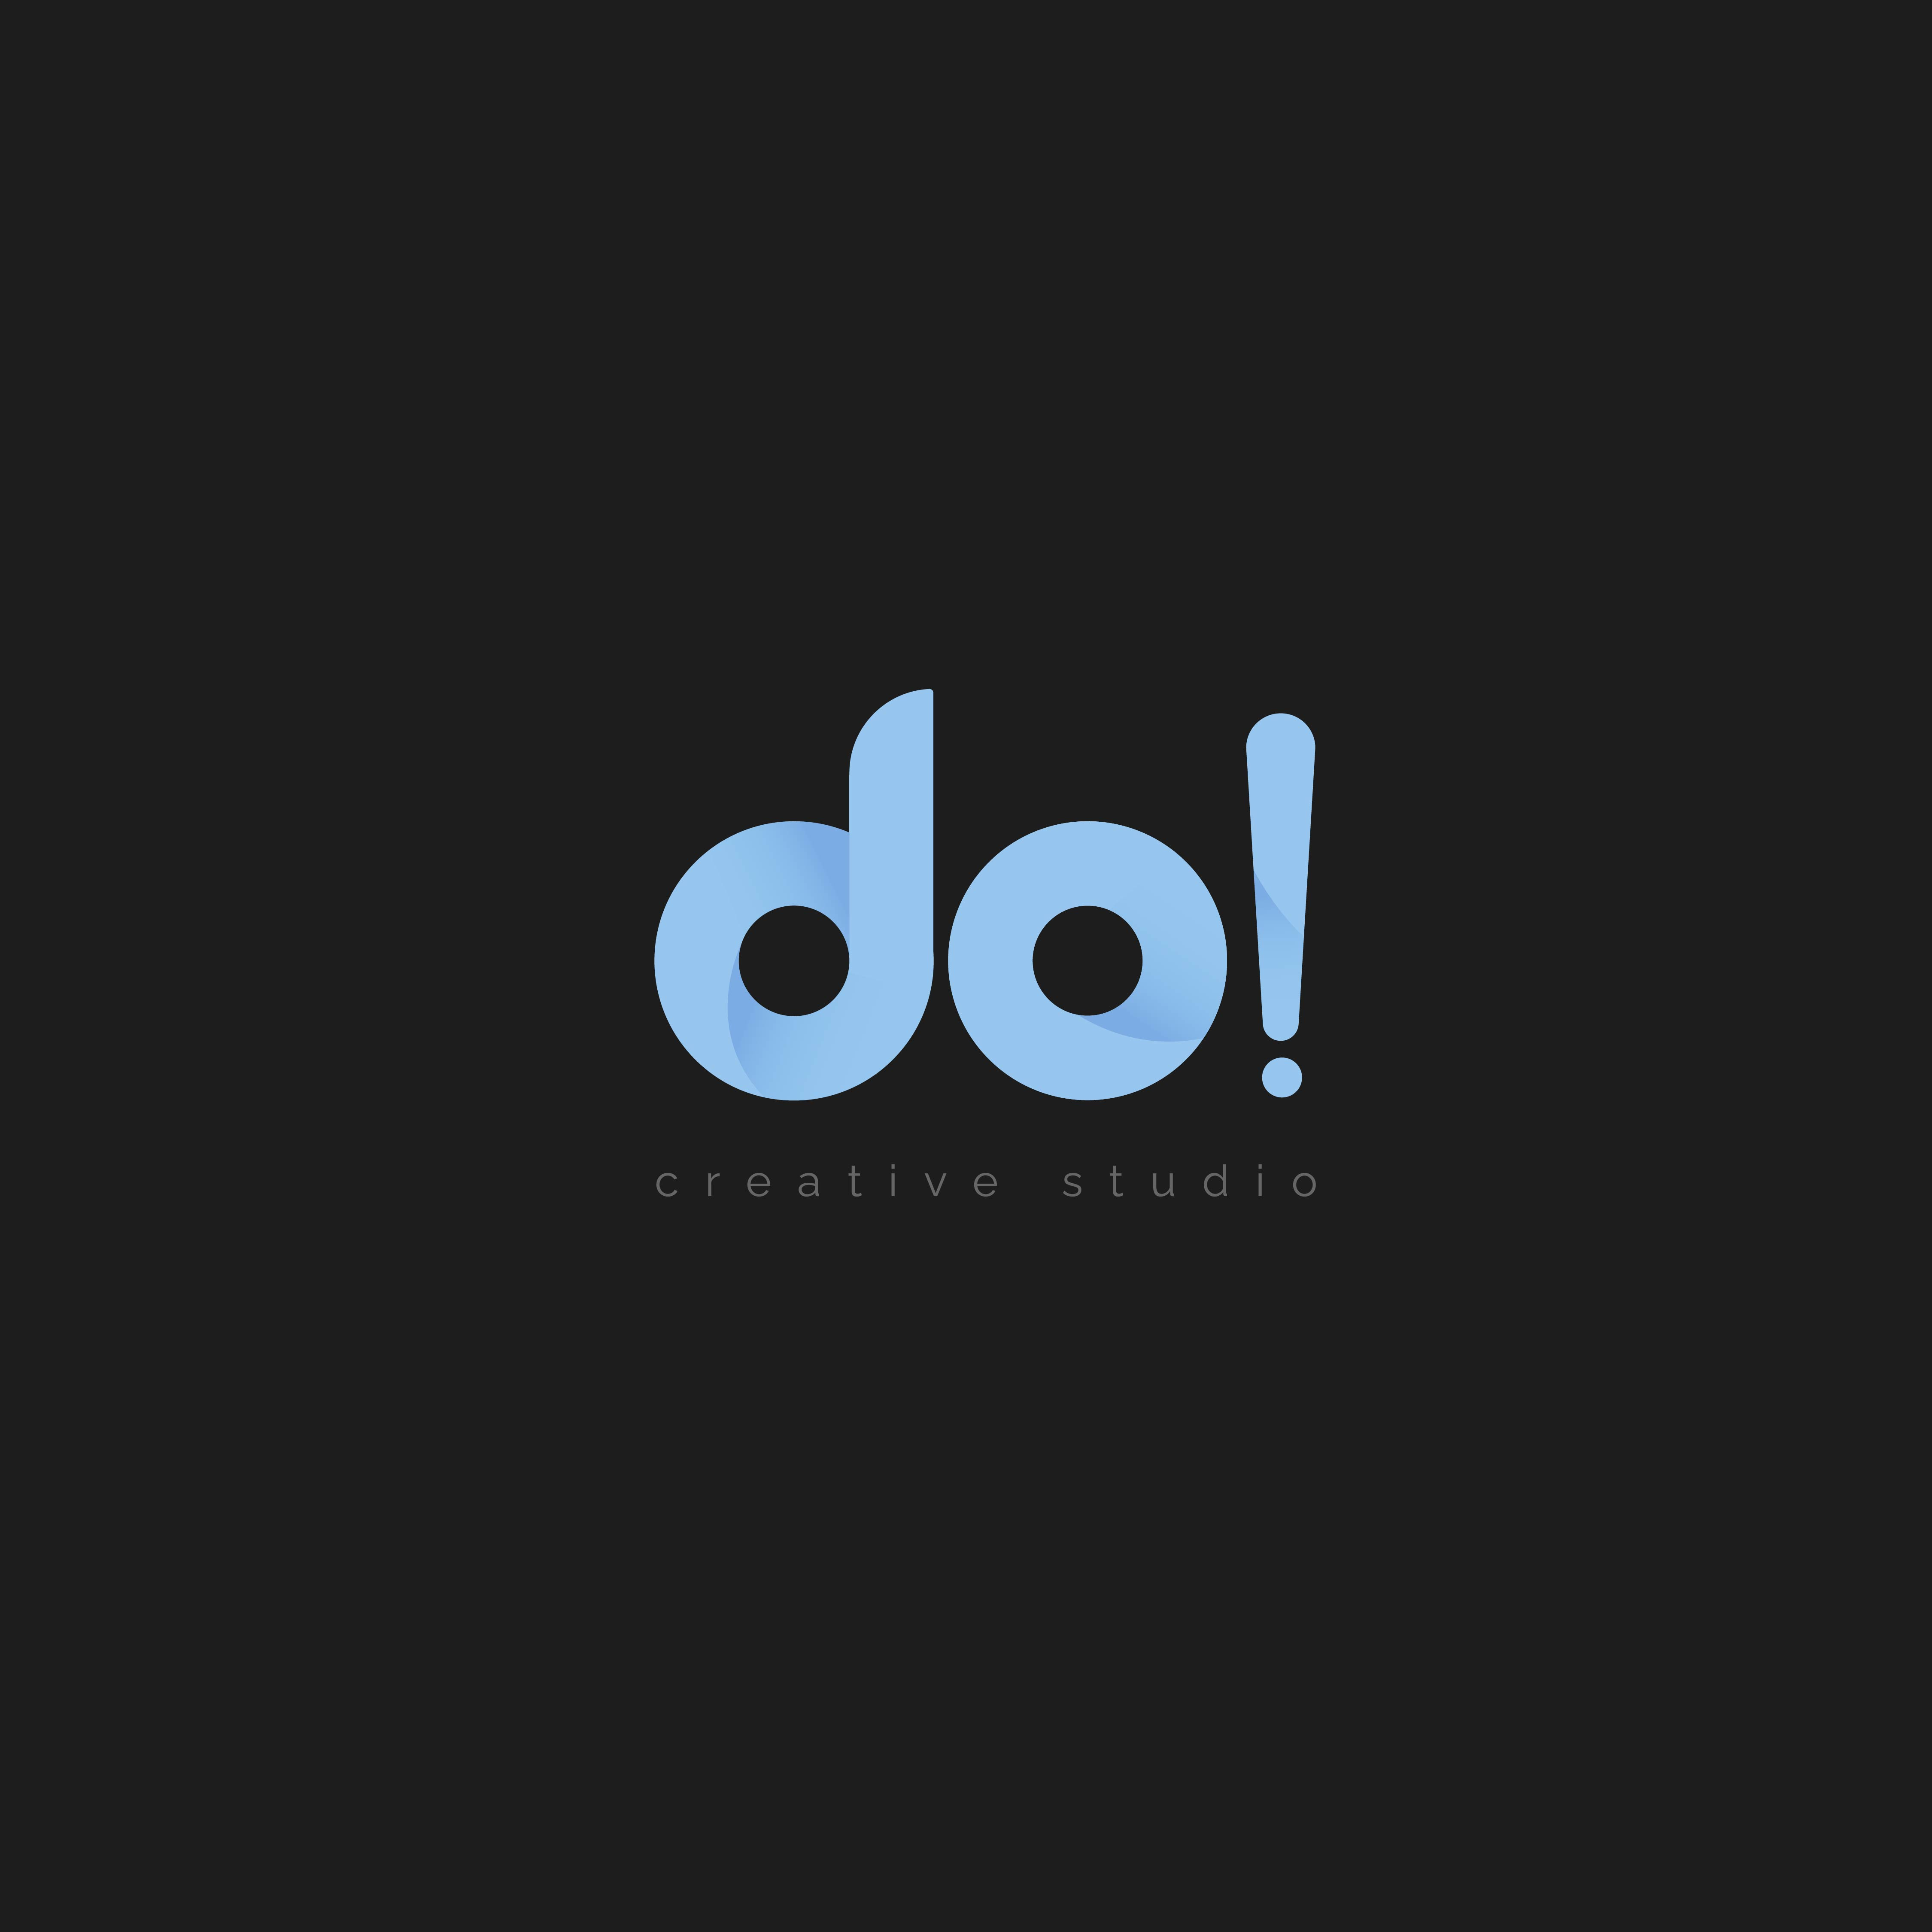 "crative studio ""do!"""